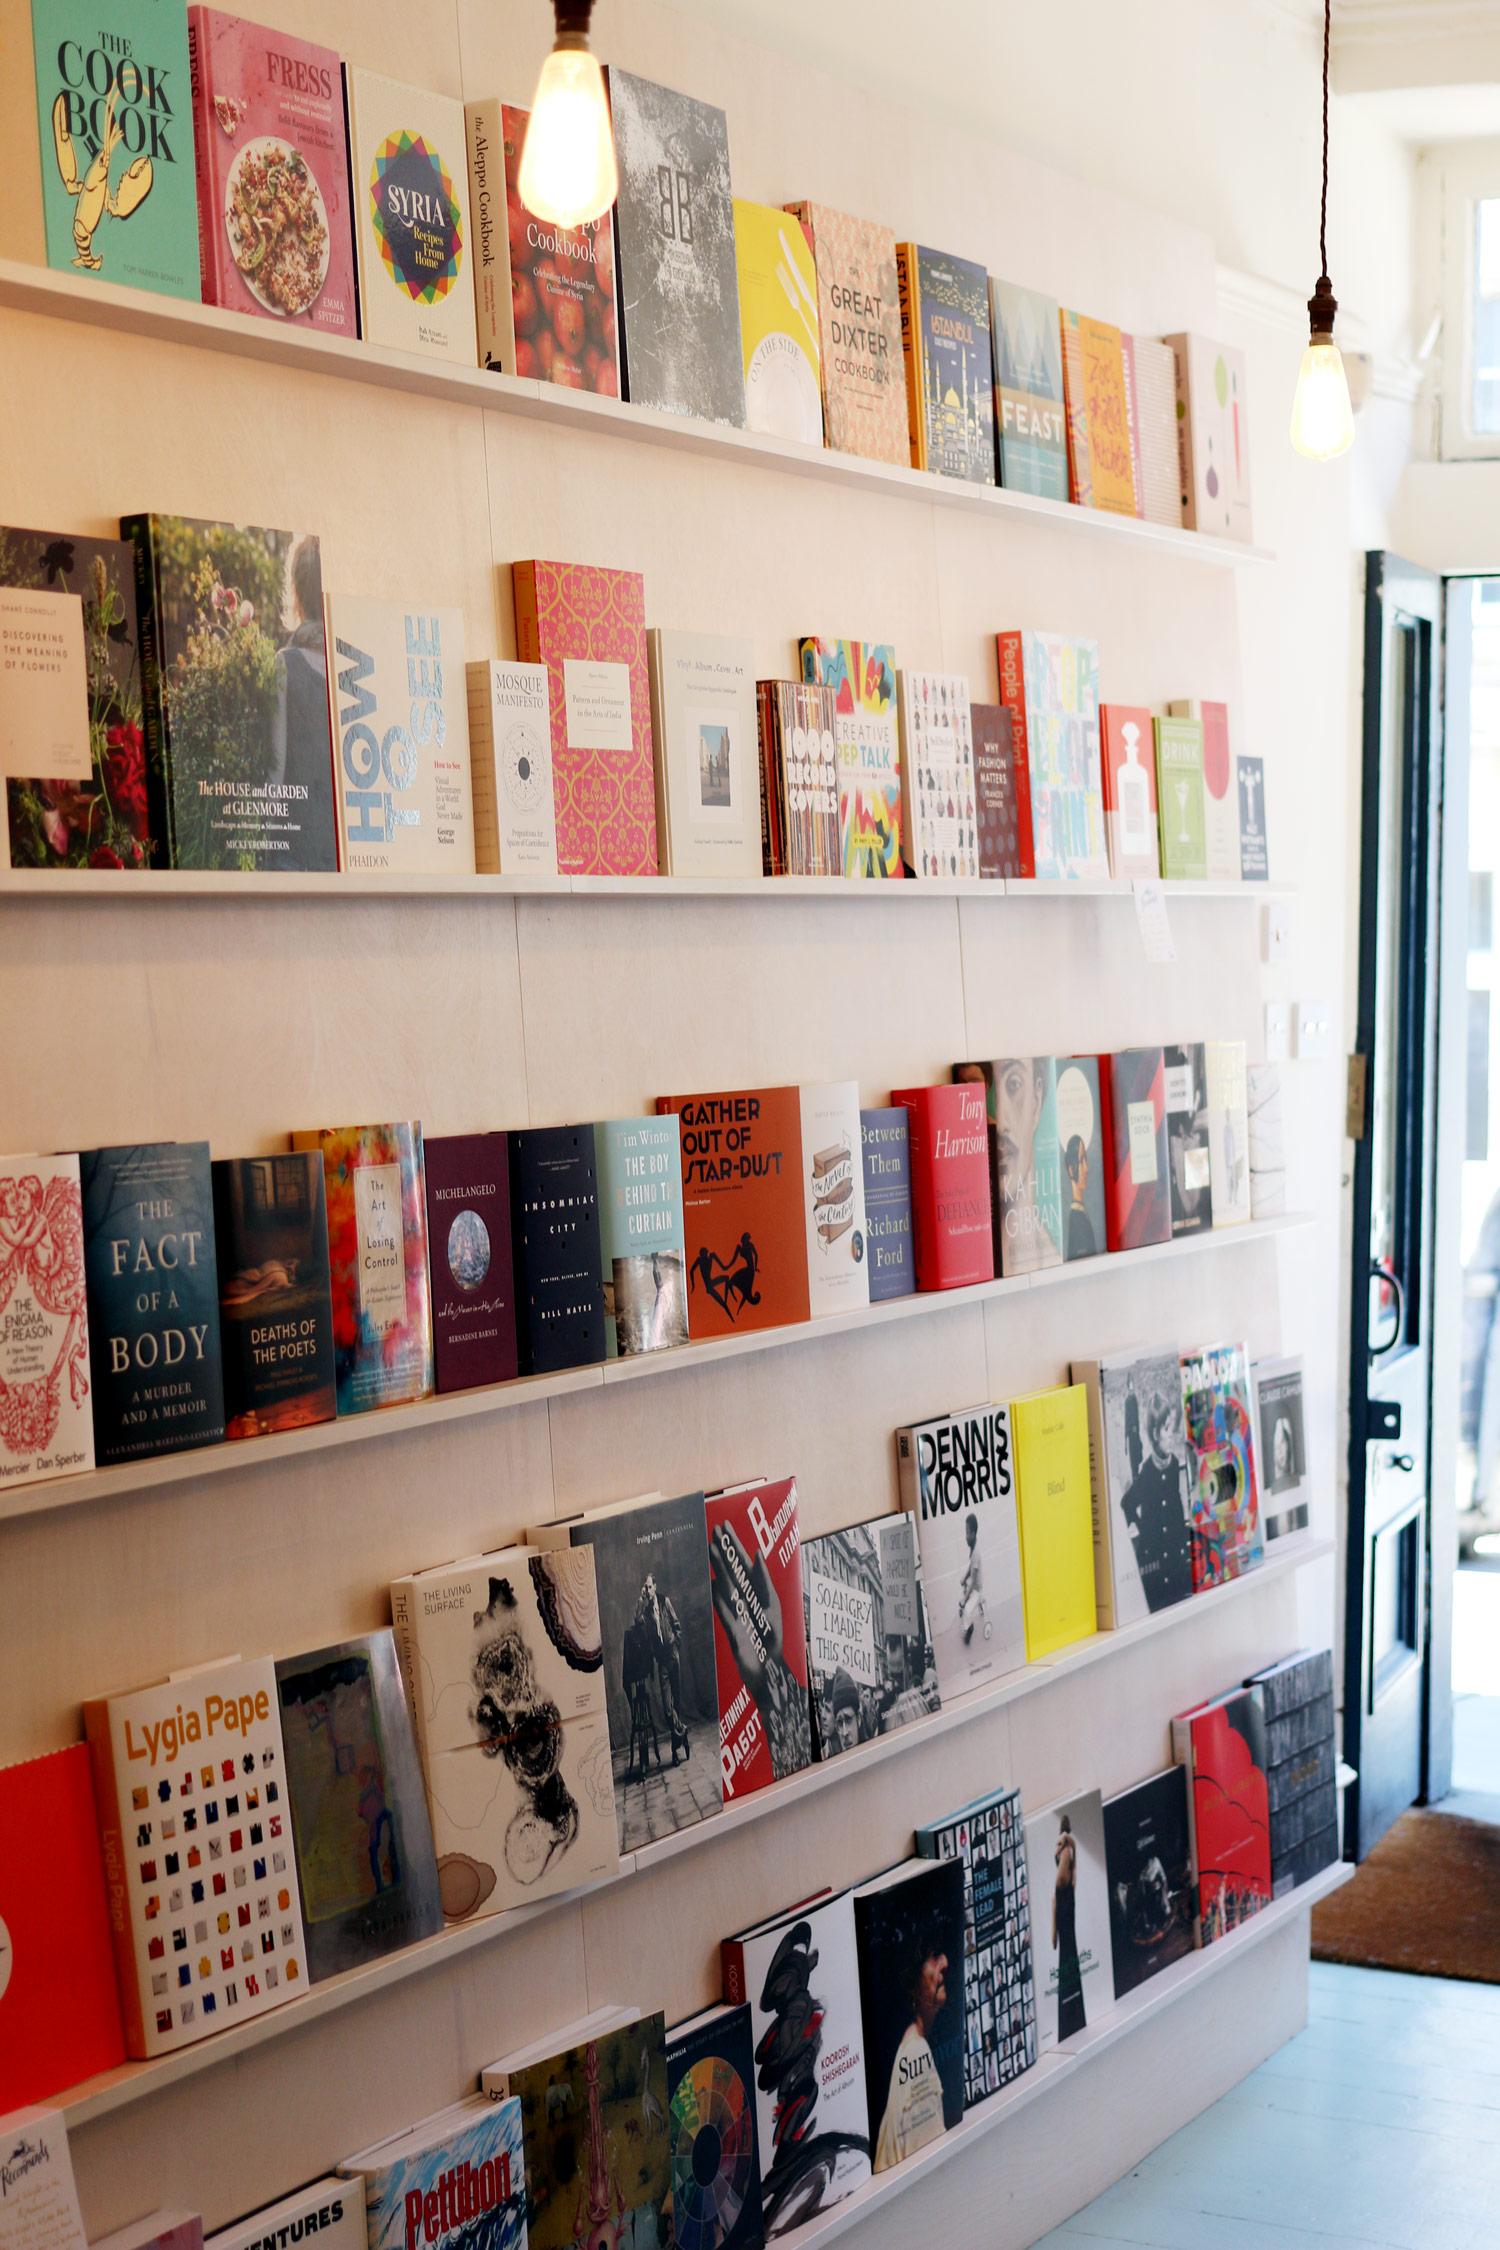 edinburgh-scotland-mercure-hotels-review-uk-travel-blogger-lifestyle-golden-hare-books-1